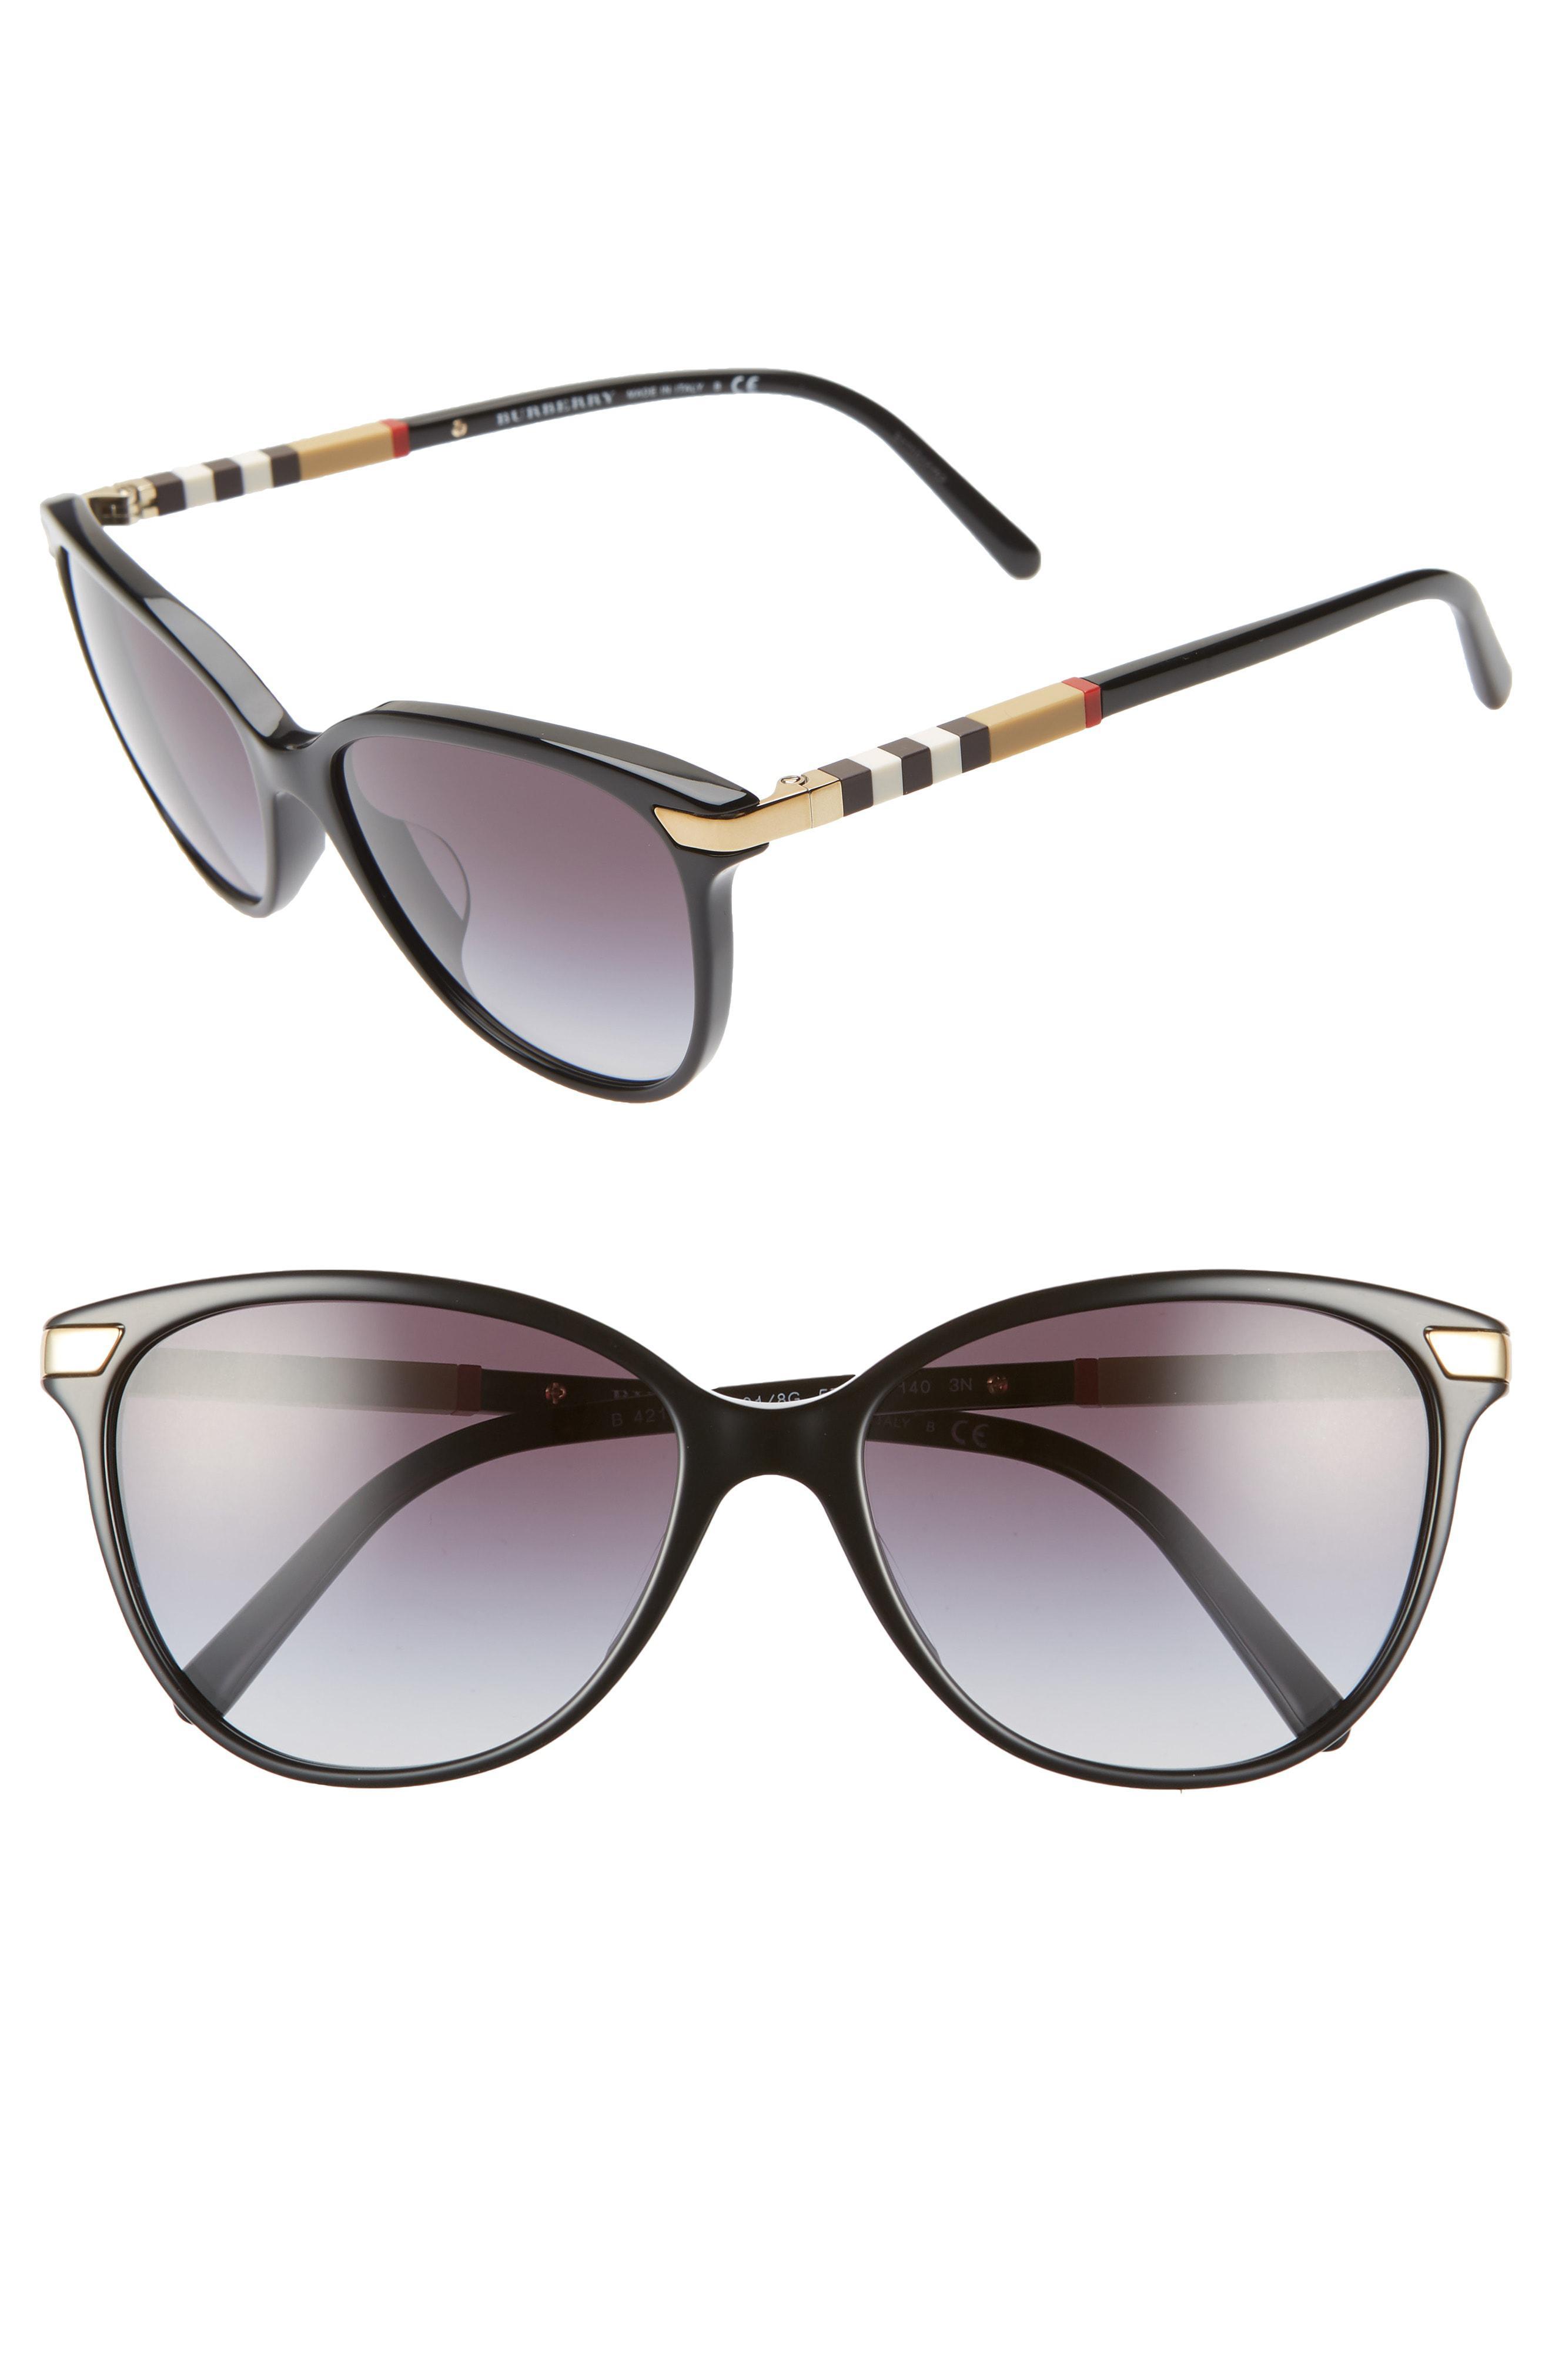 e0b929f176c Lyst - Burberry 57mm Sunglasses in Black